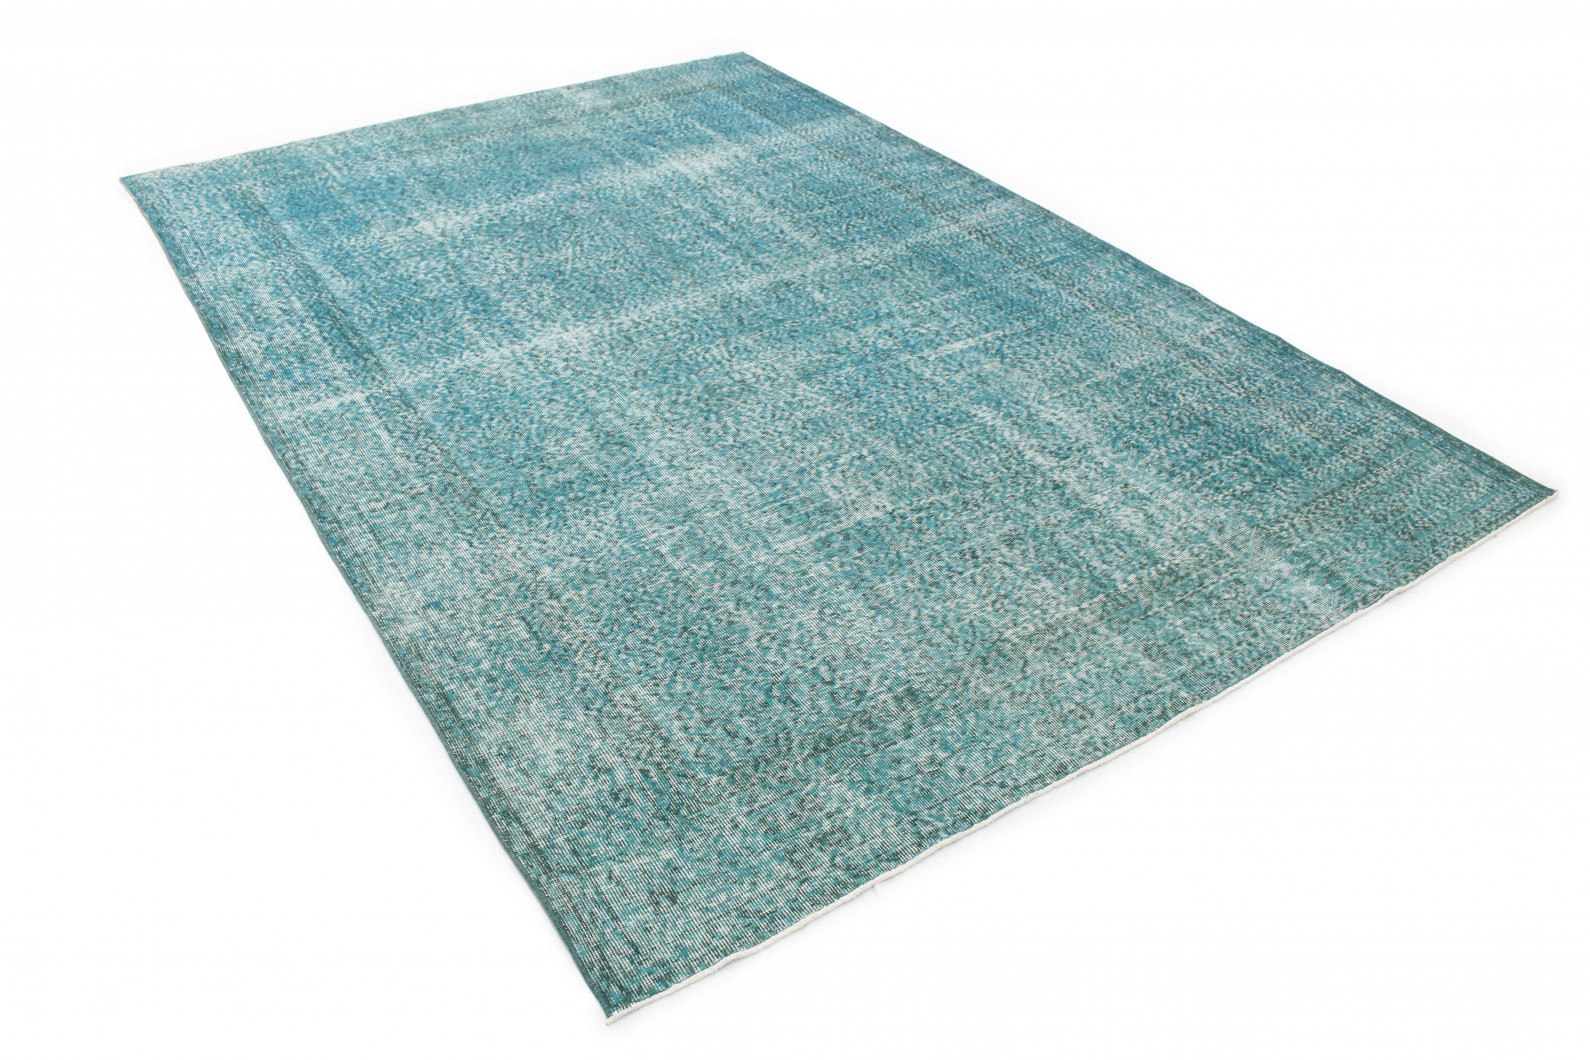 vintage teppich t rkis in 310x210 1011 5180 bei kaufen. Black Bedroom Furniture Sets. Home Design Ideas